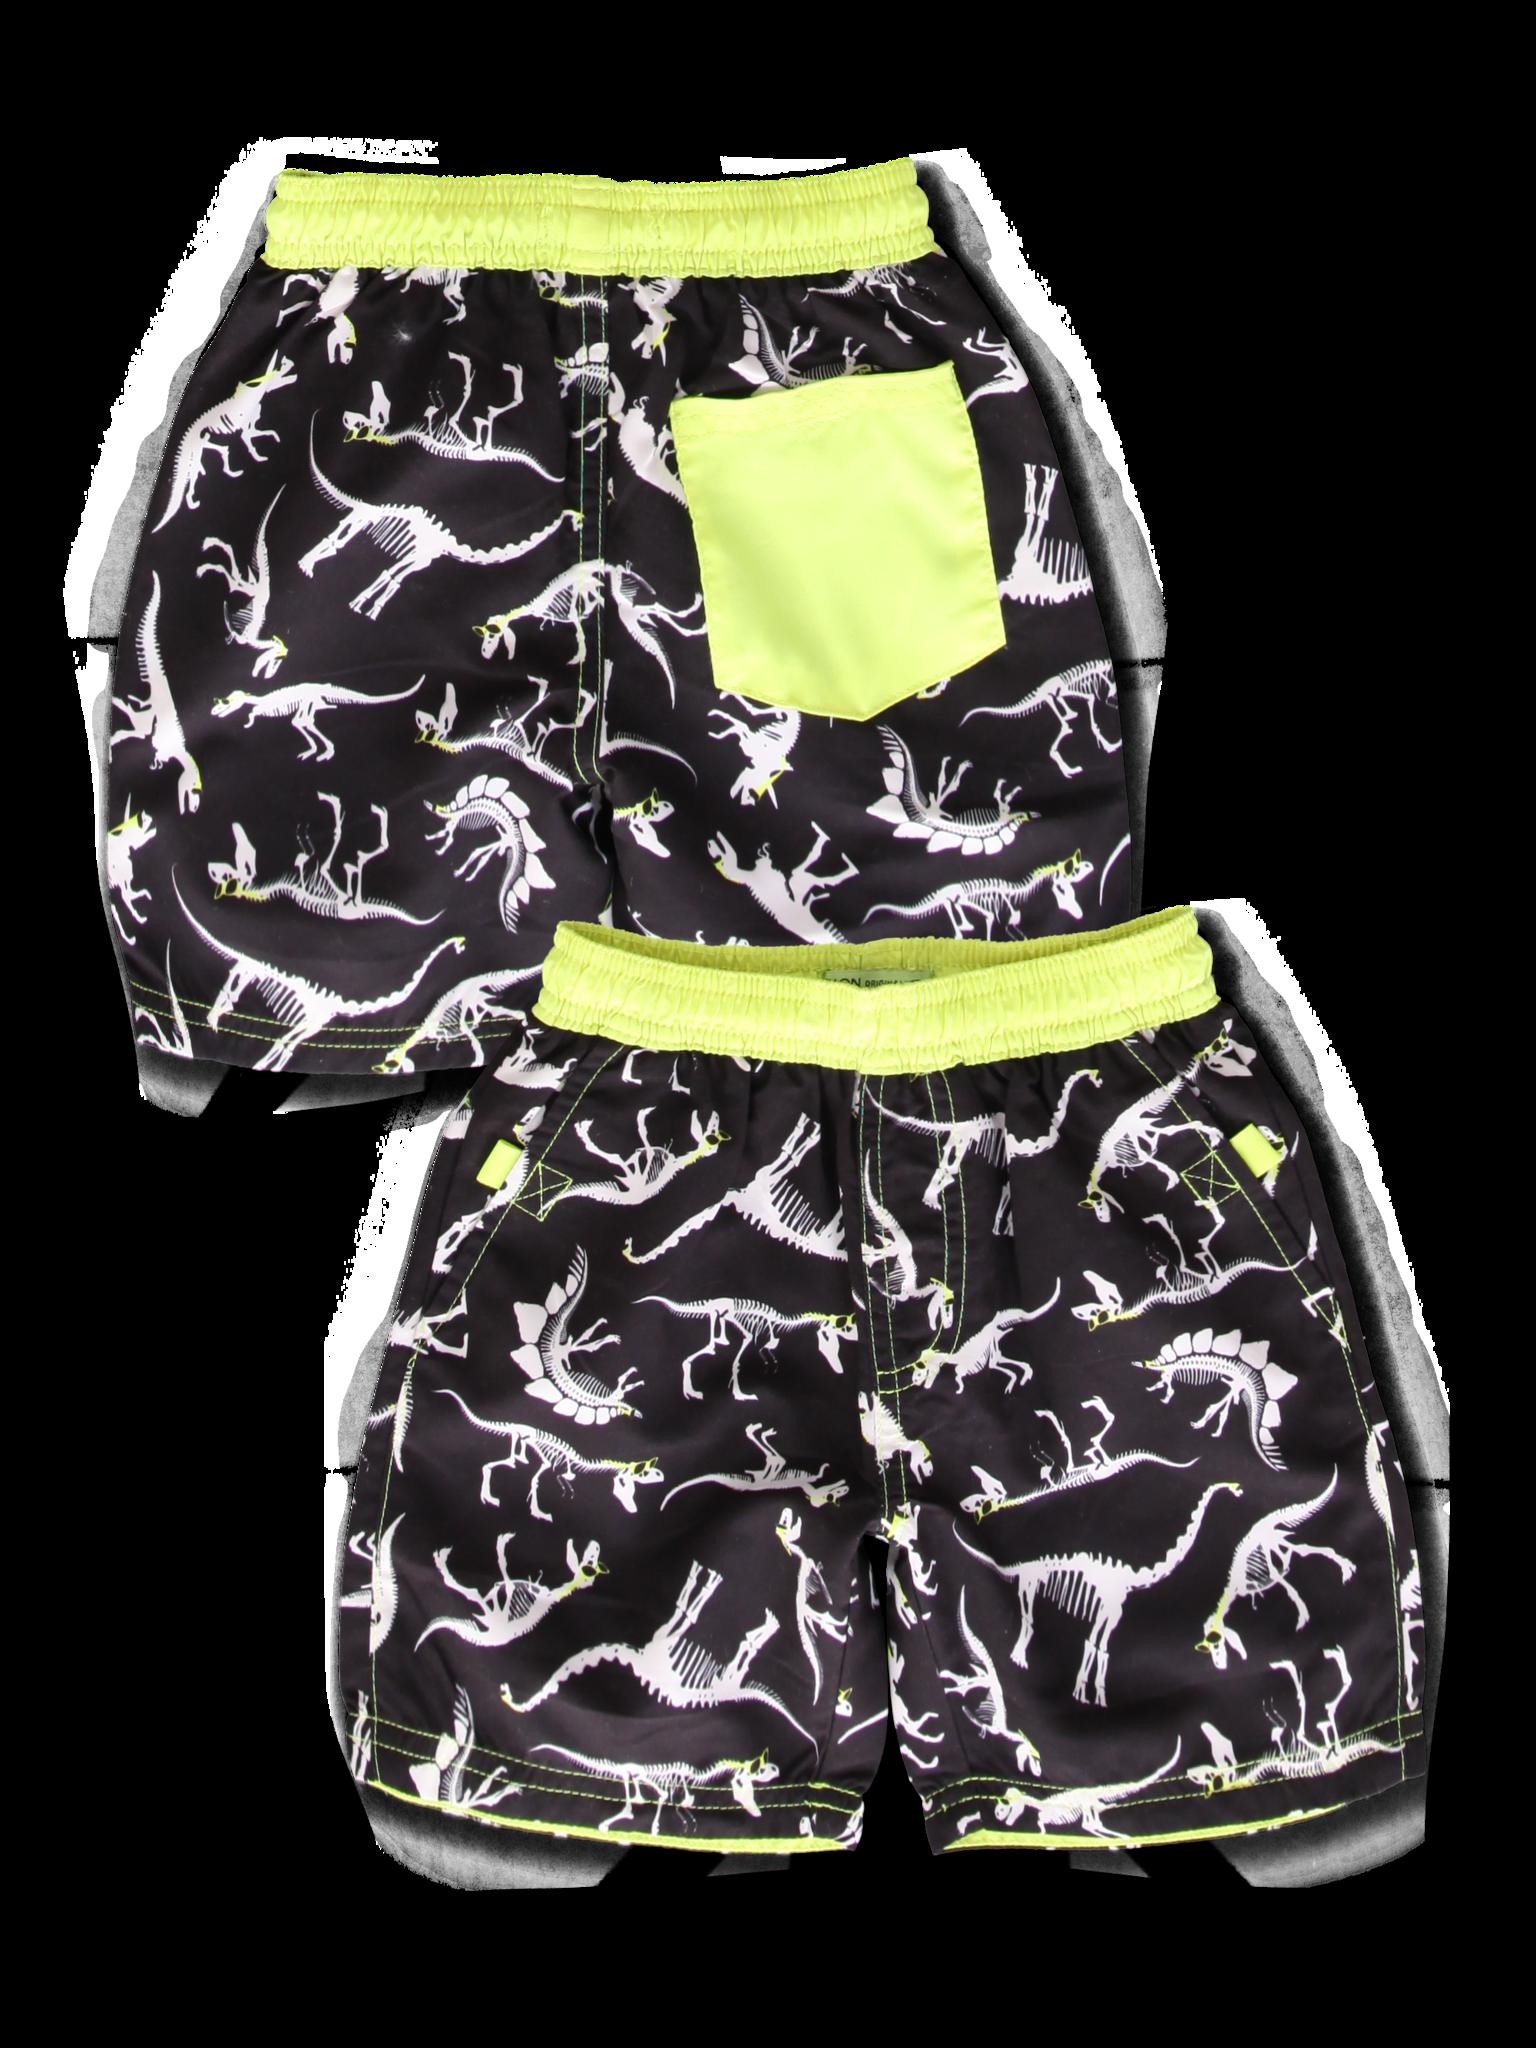 All Brands | Summerproducts Small Boys | Swimwear | 12 pcs/box